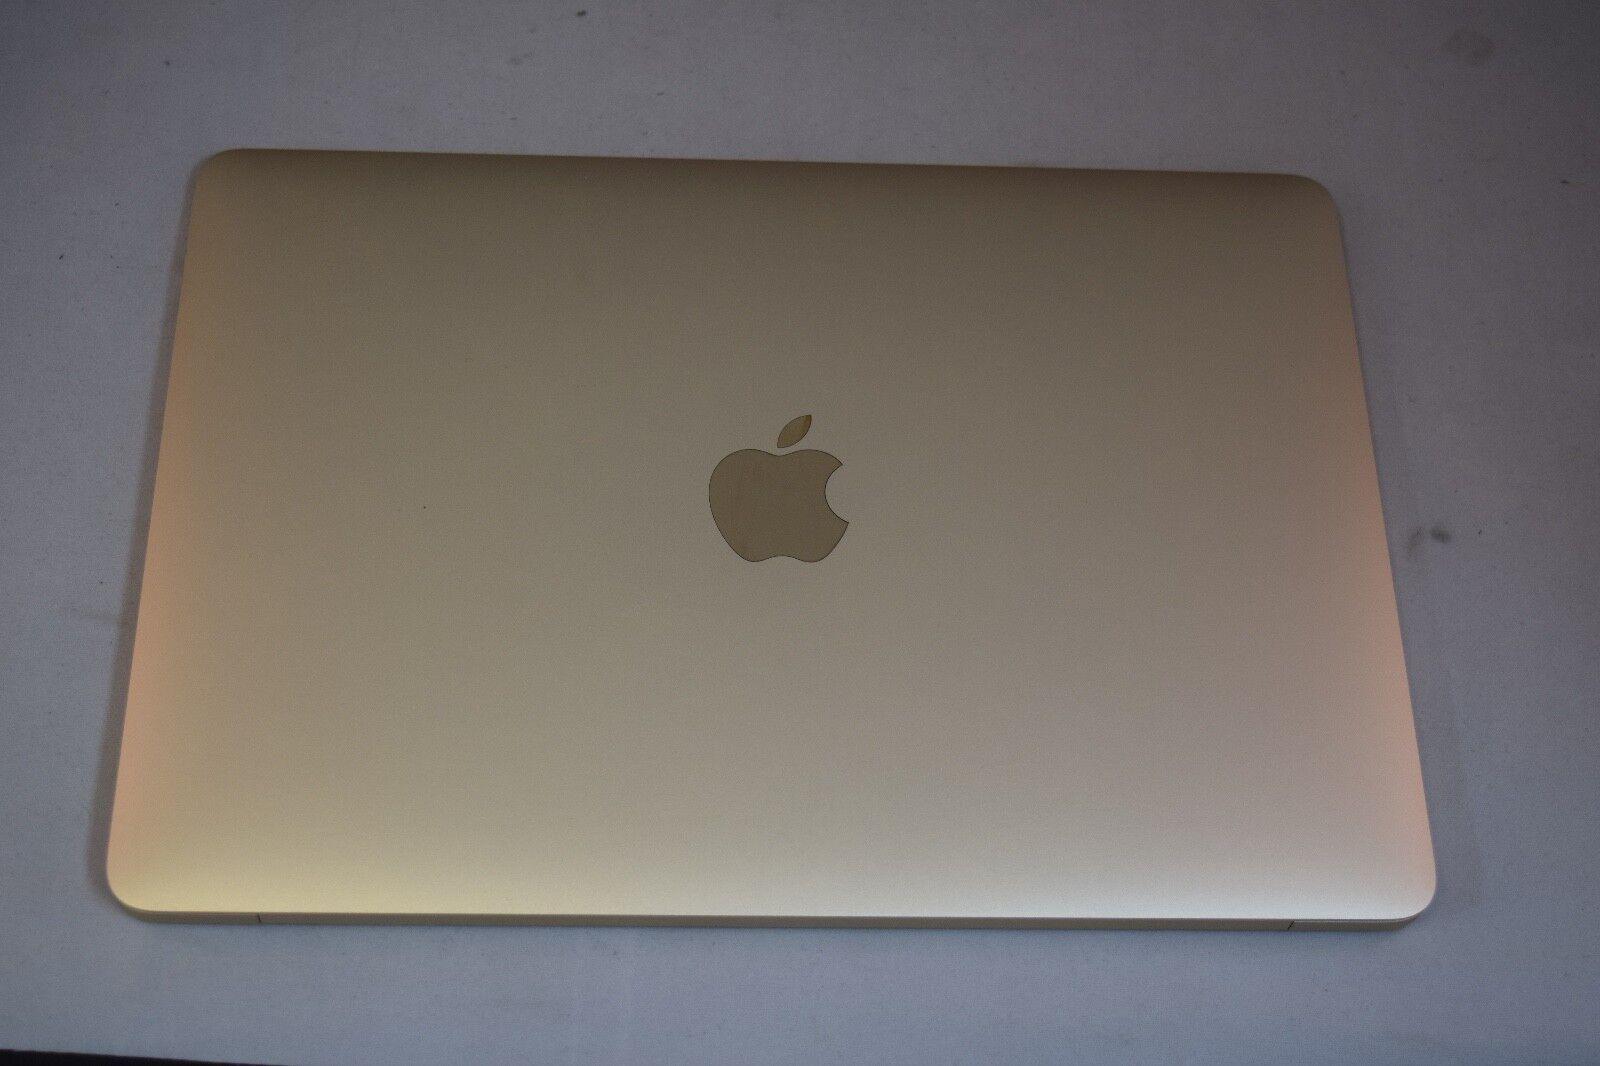 "Apple MacBook 12"" Laptop - MK4M2LL/A (2015, Gold) NR Free Ship"